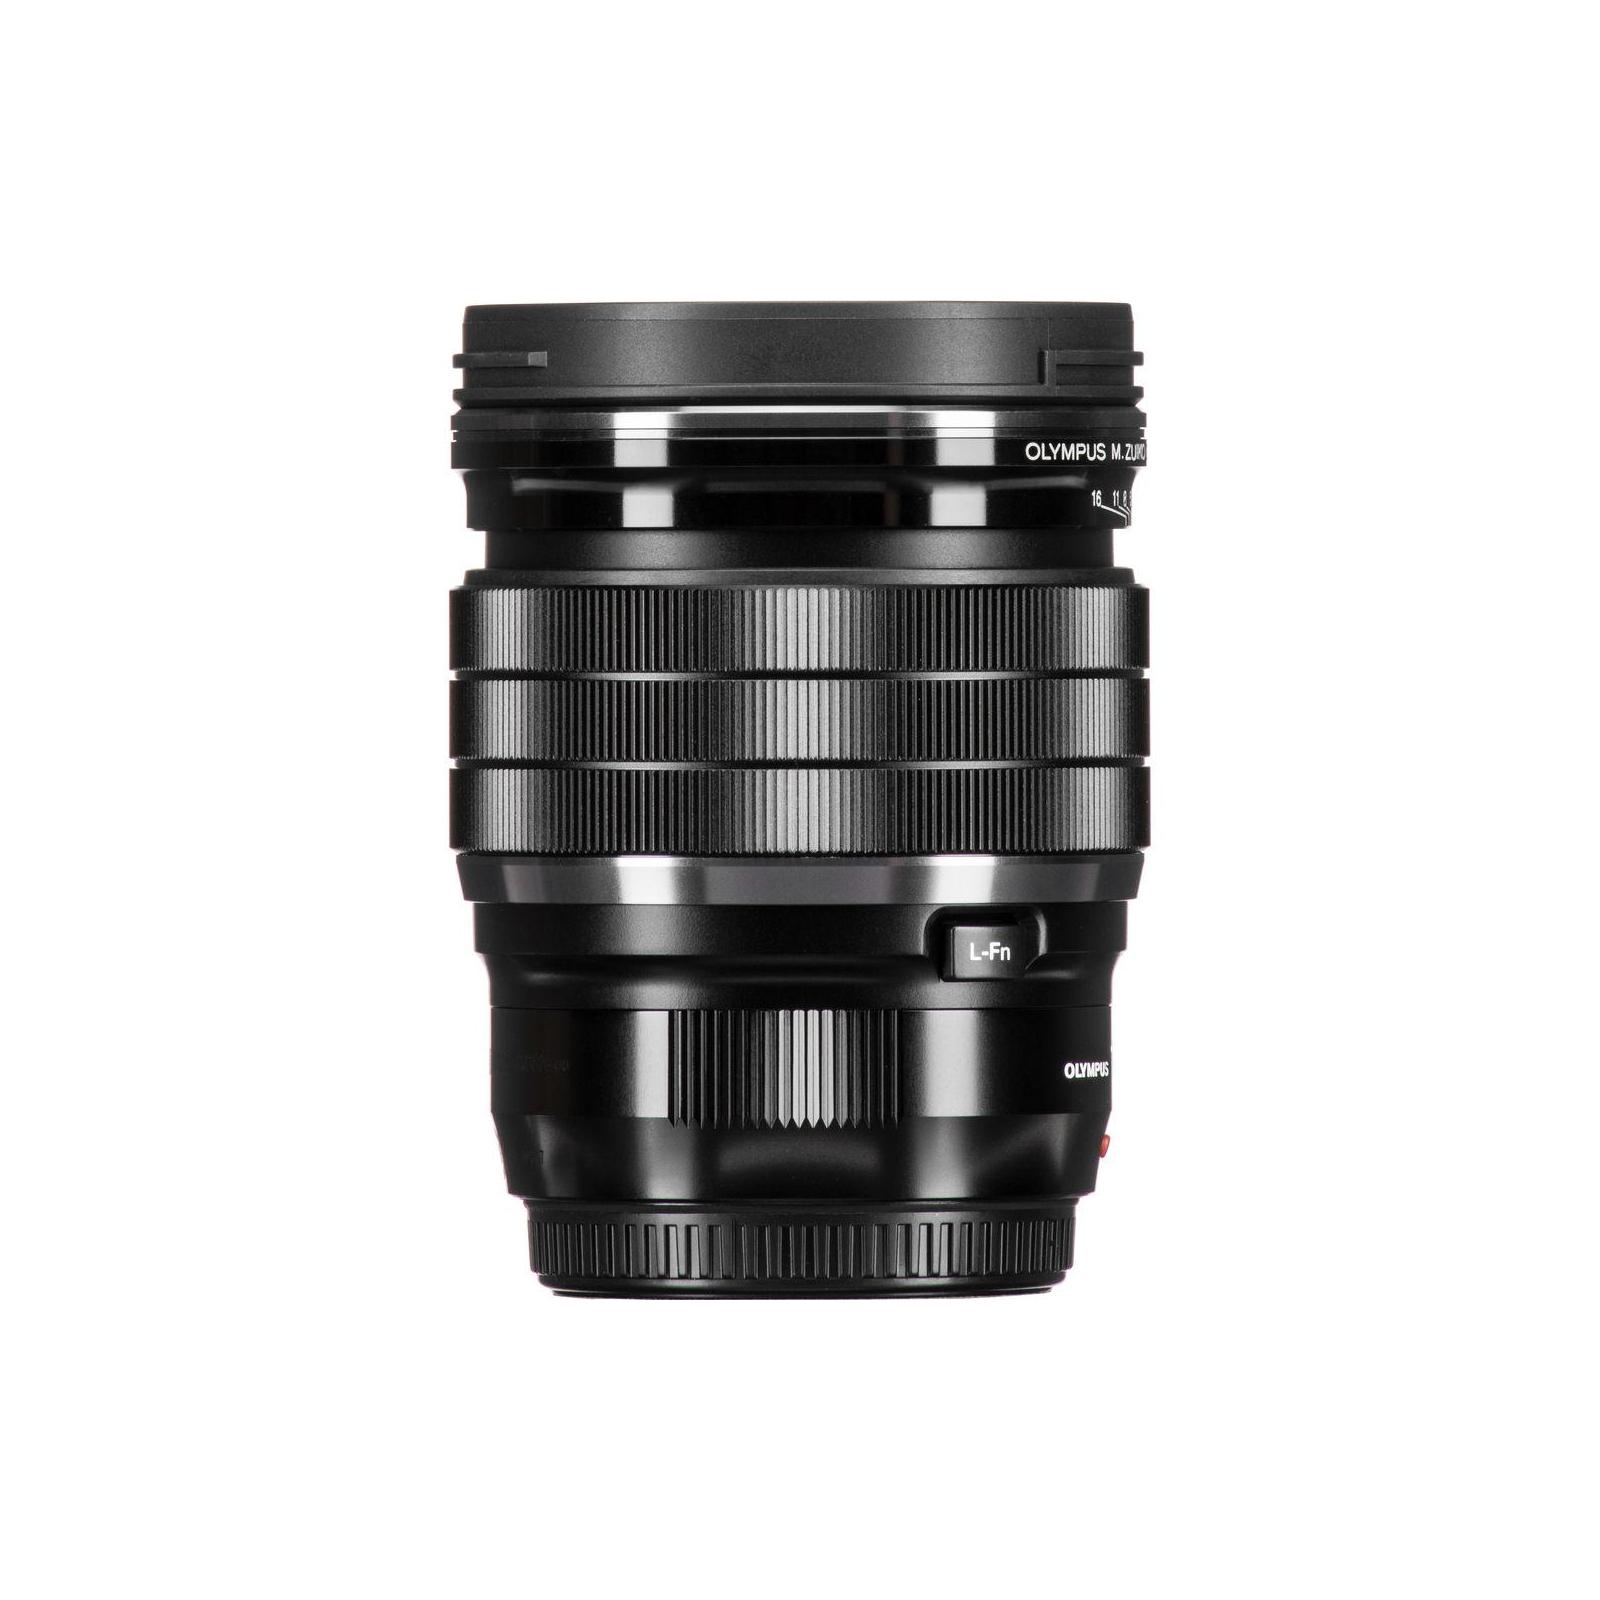 Объектив OLYMPUS EW-M1712 17mm 1:1.2 PRO Black (V311100BW000) изображение 10